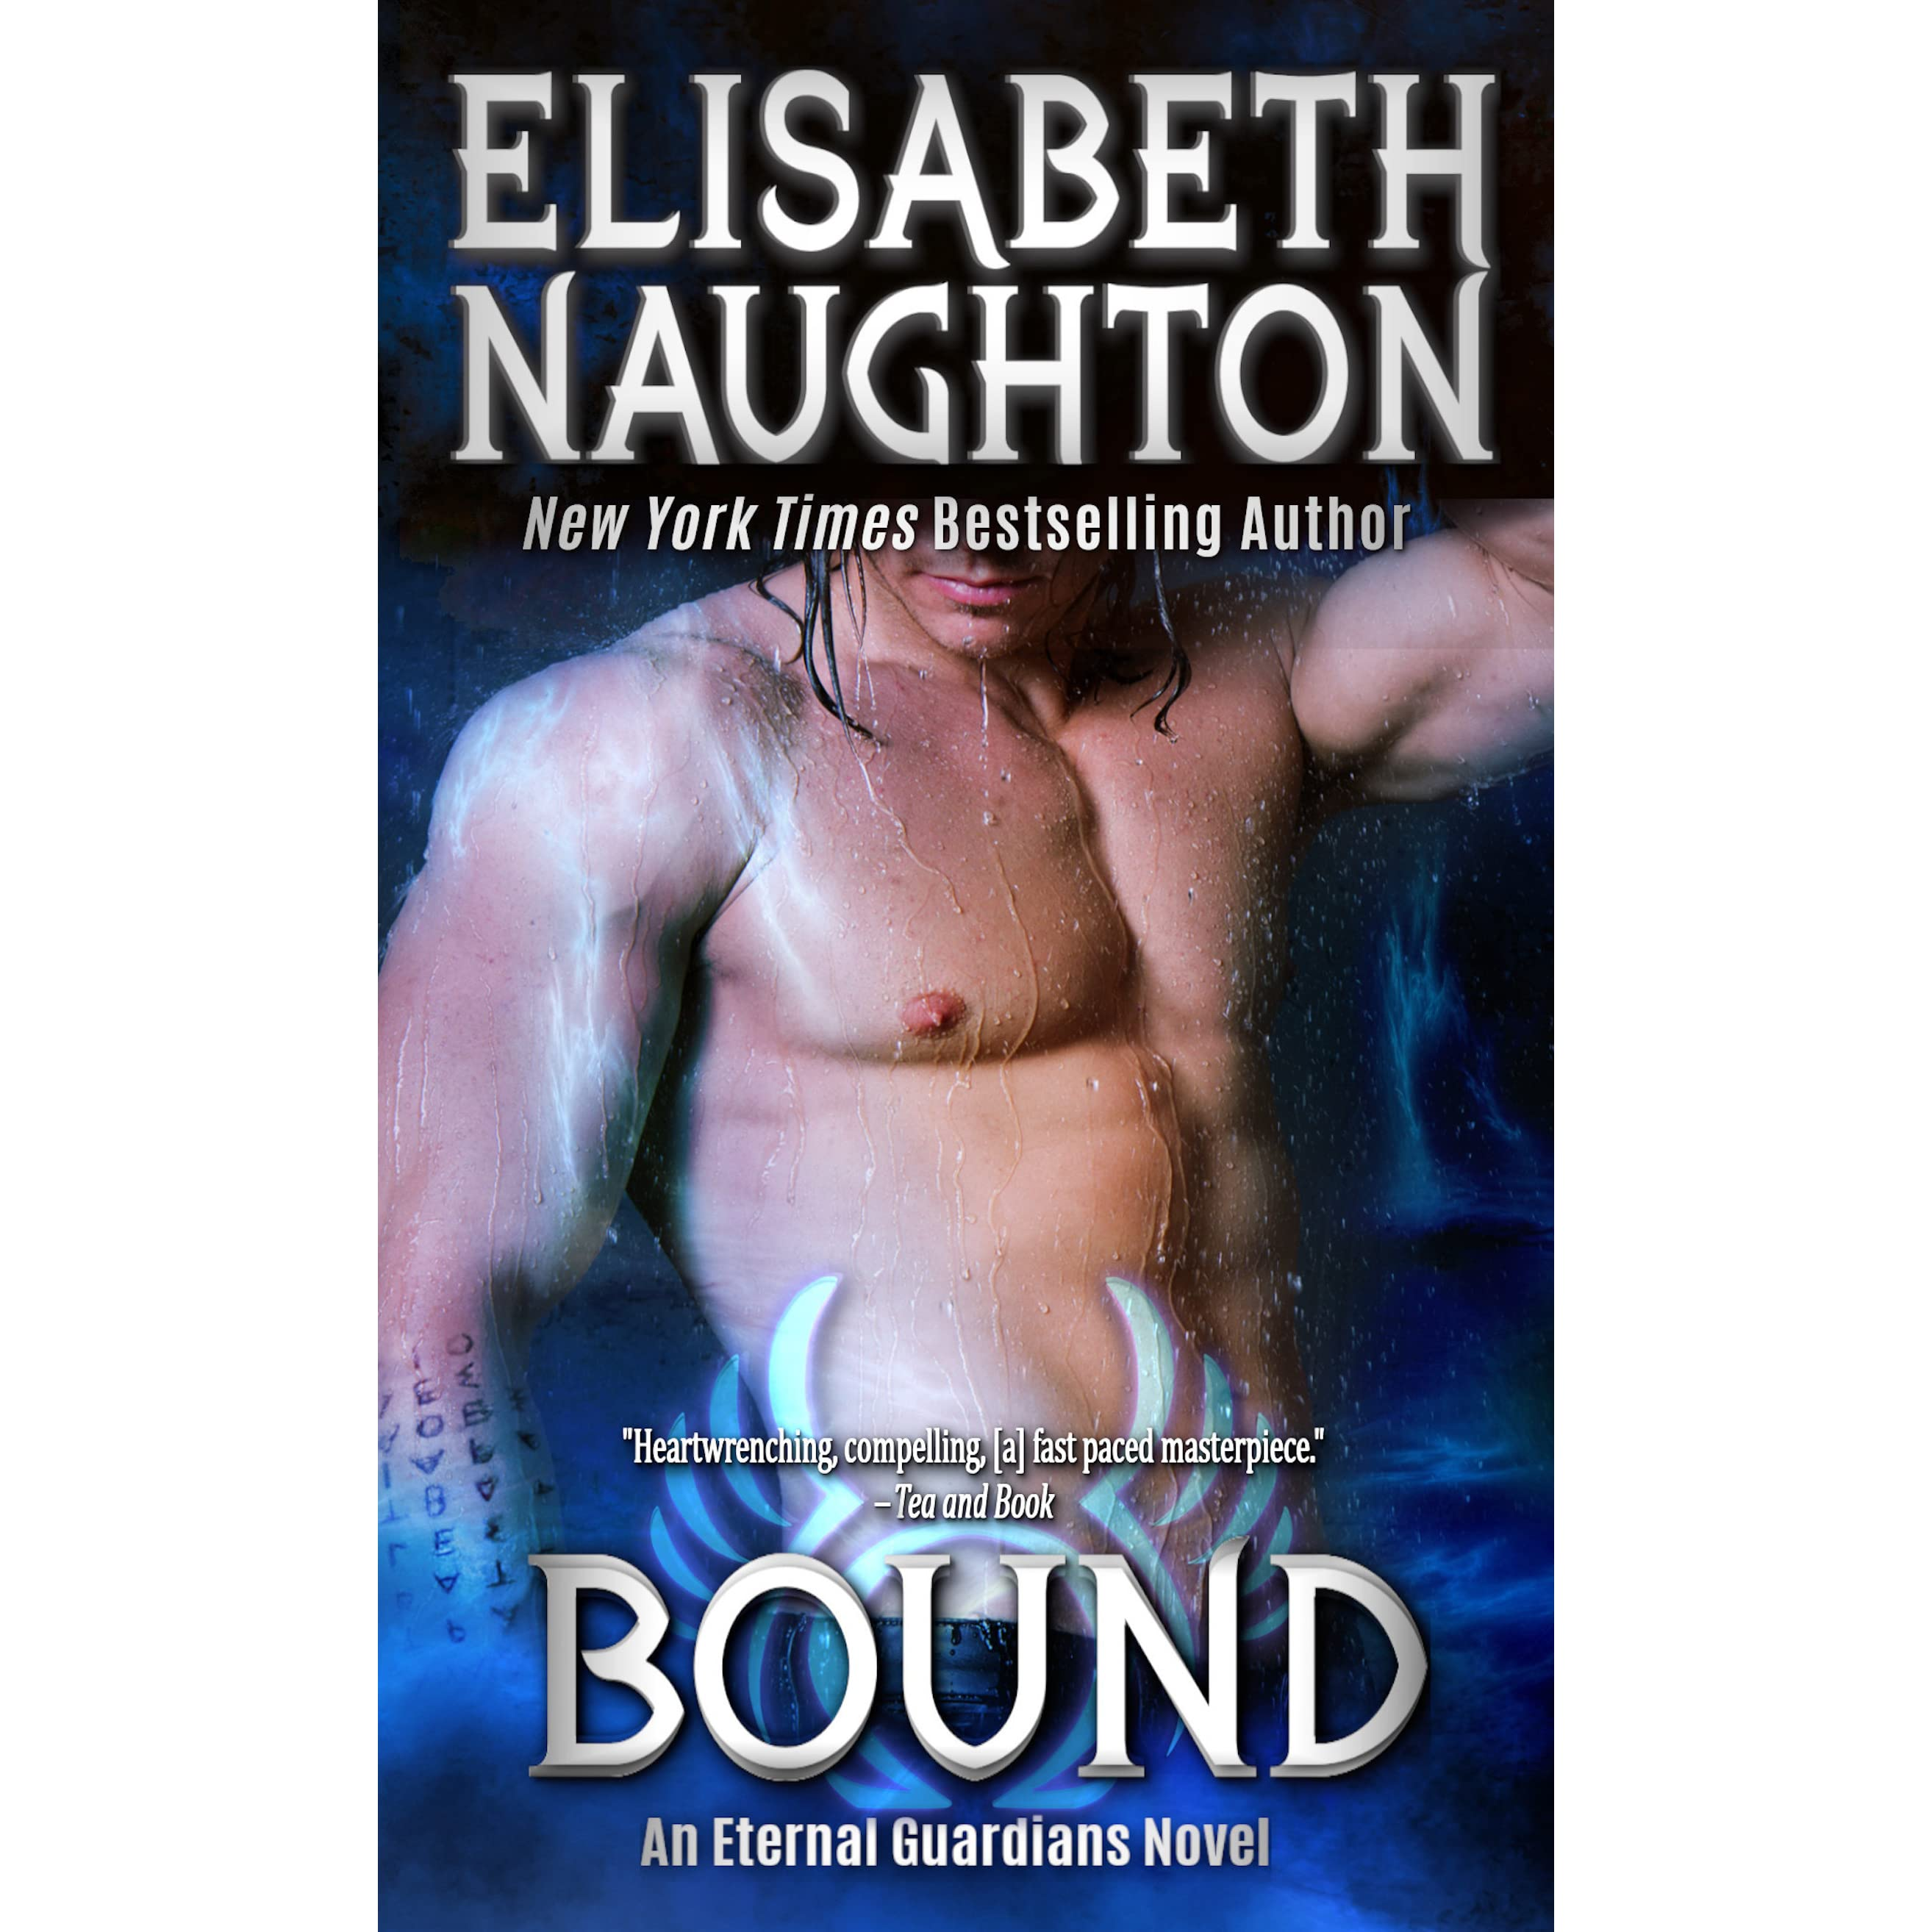 Bound (Eternal Guardians, #6) by Elisabeth Naughton